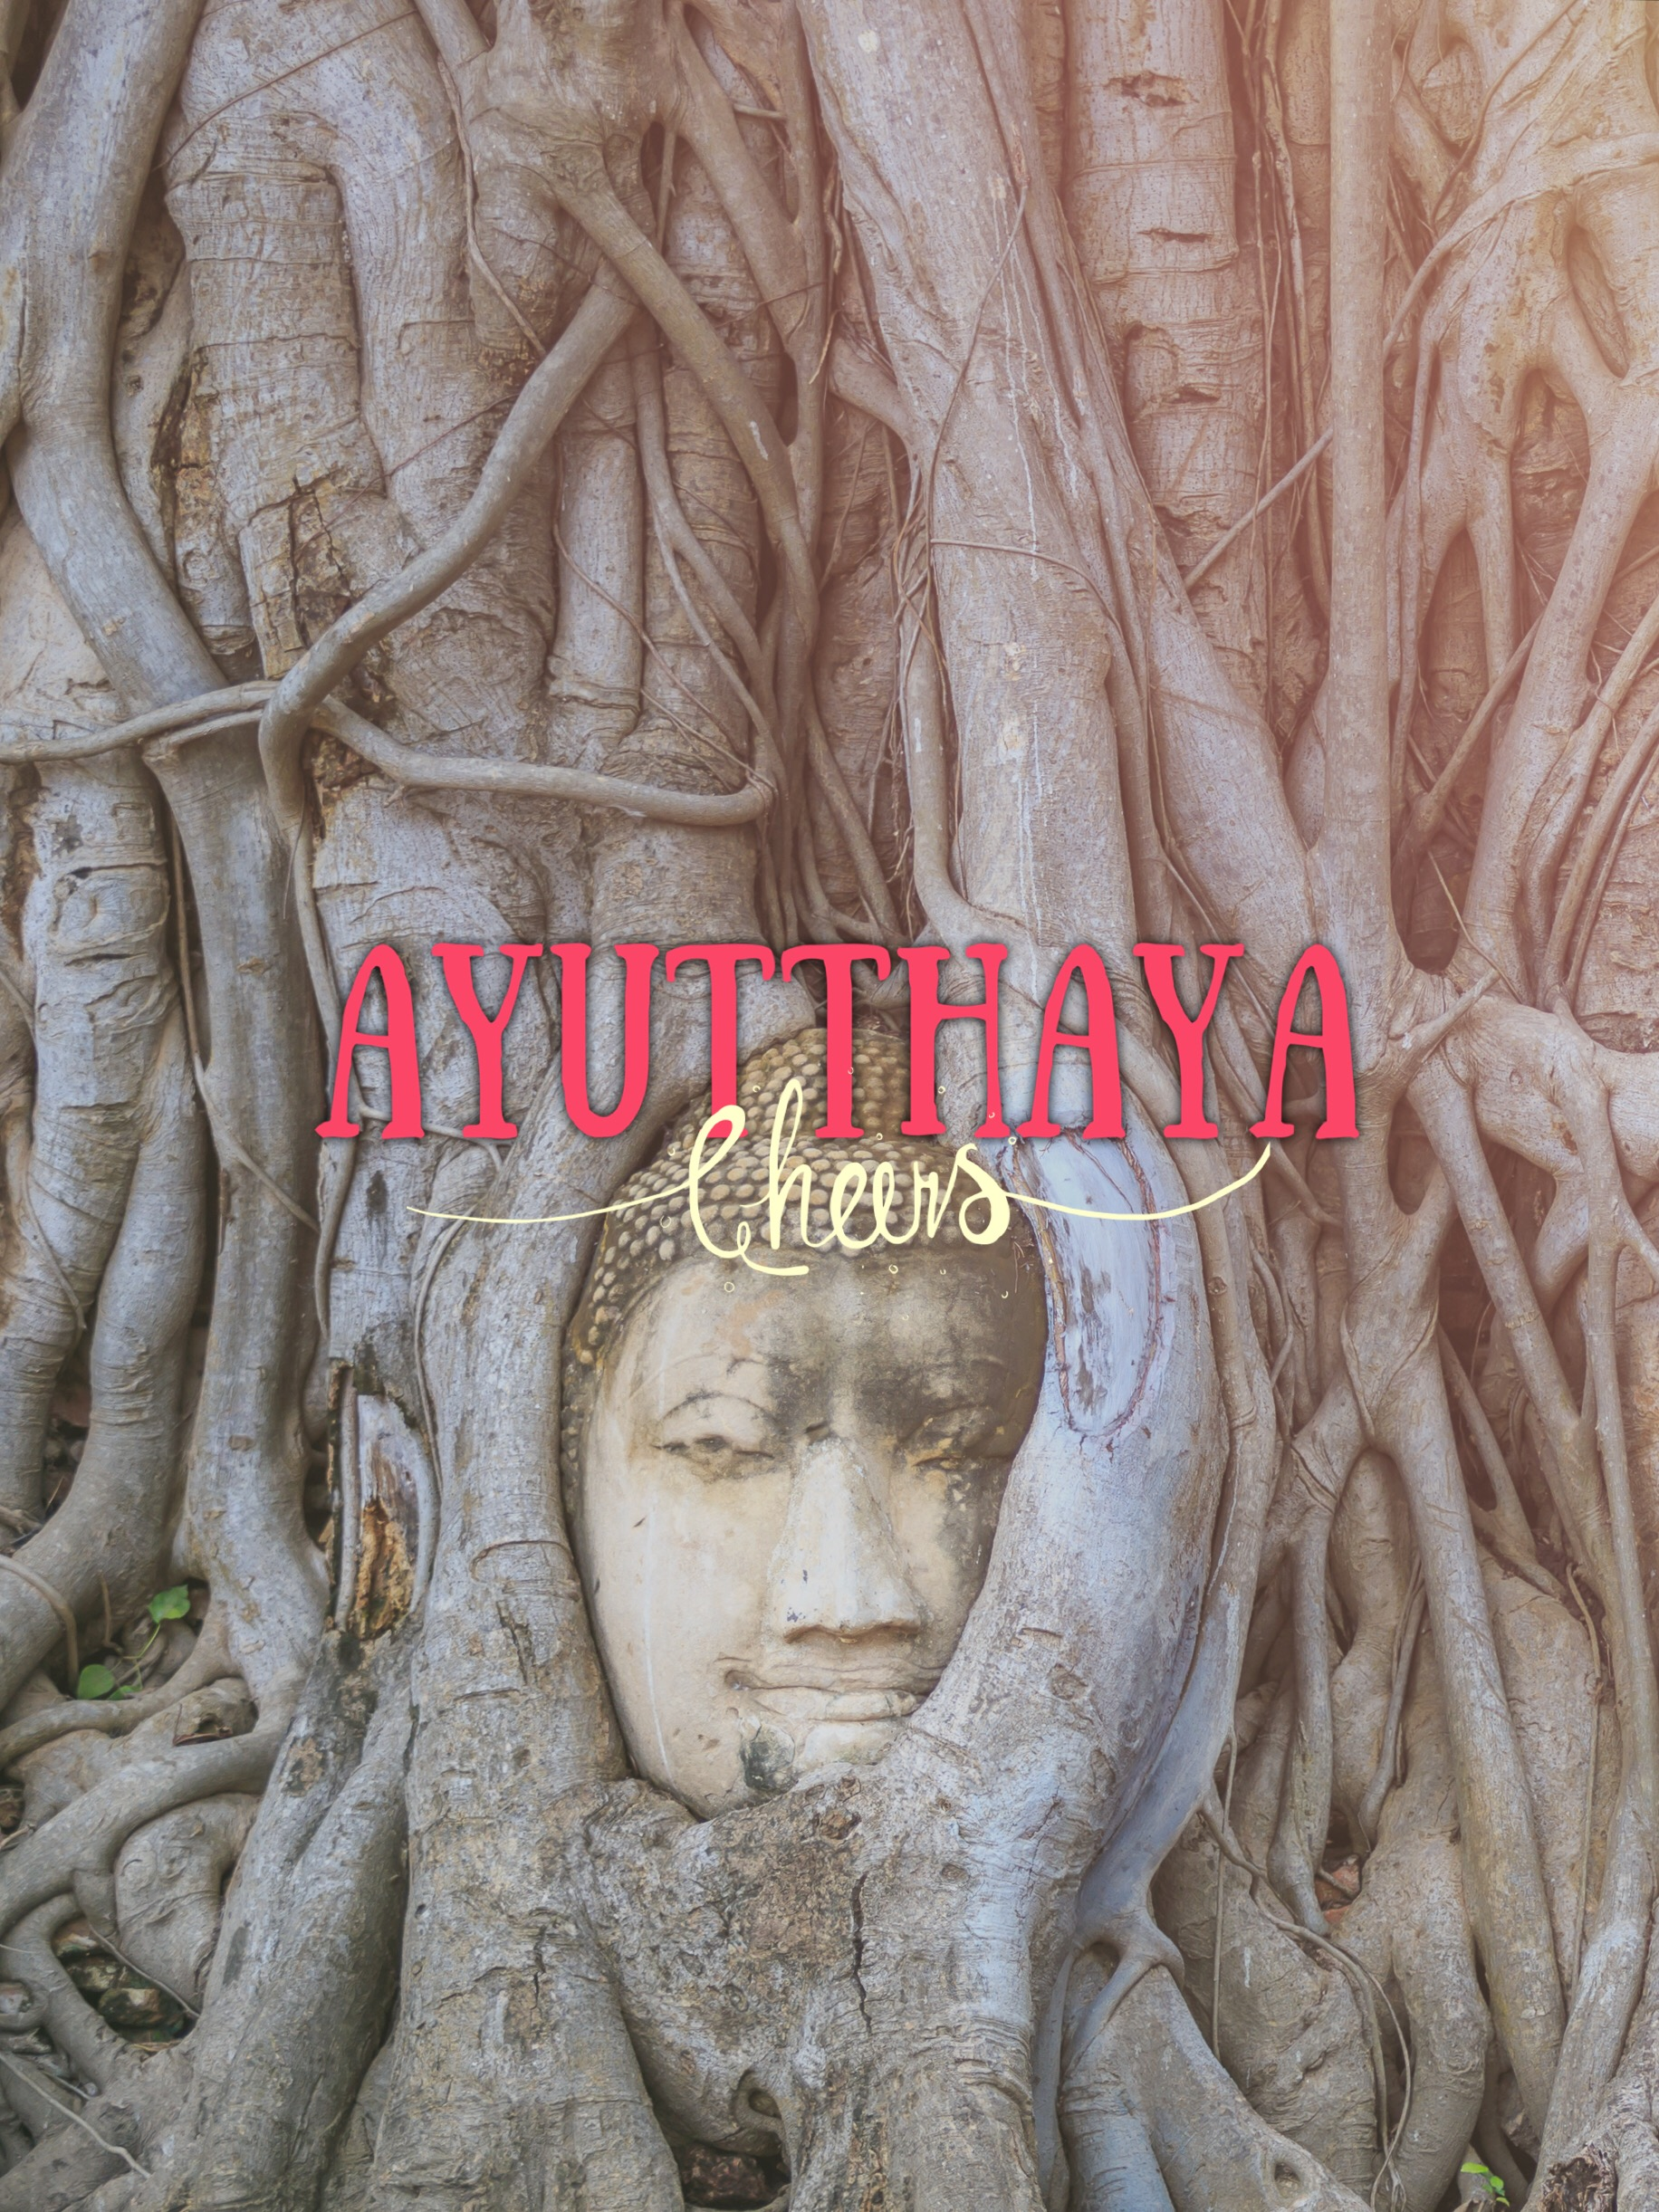 A Memoir of Ayutthaya